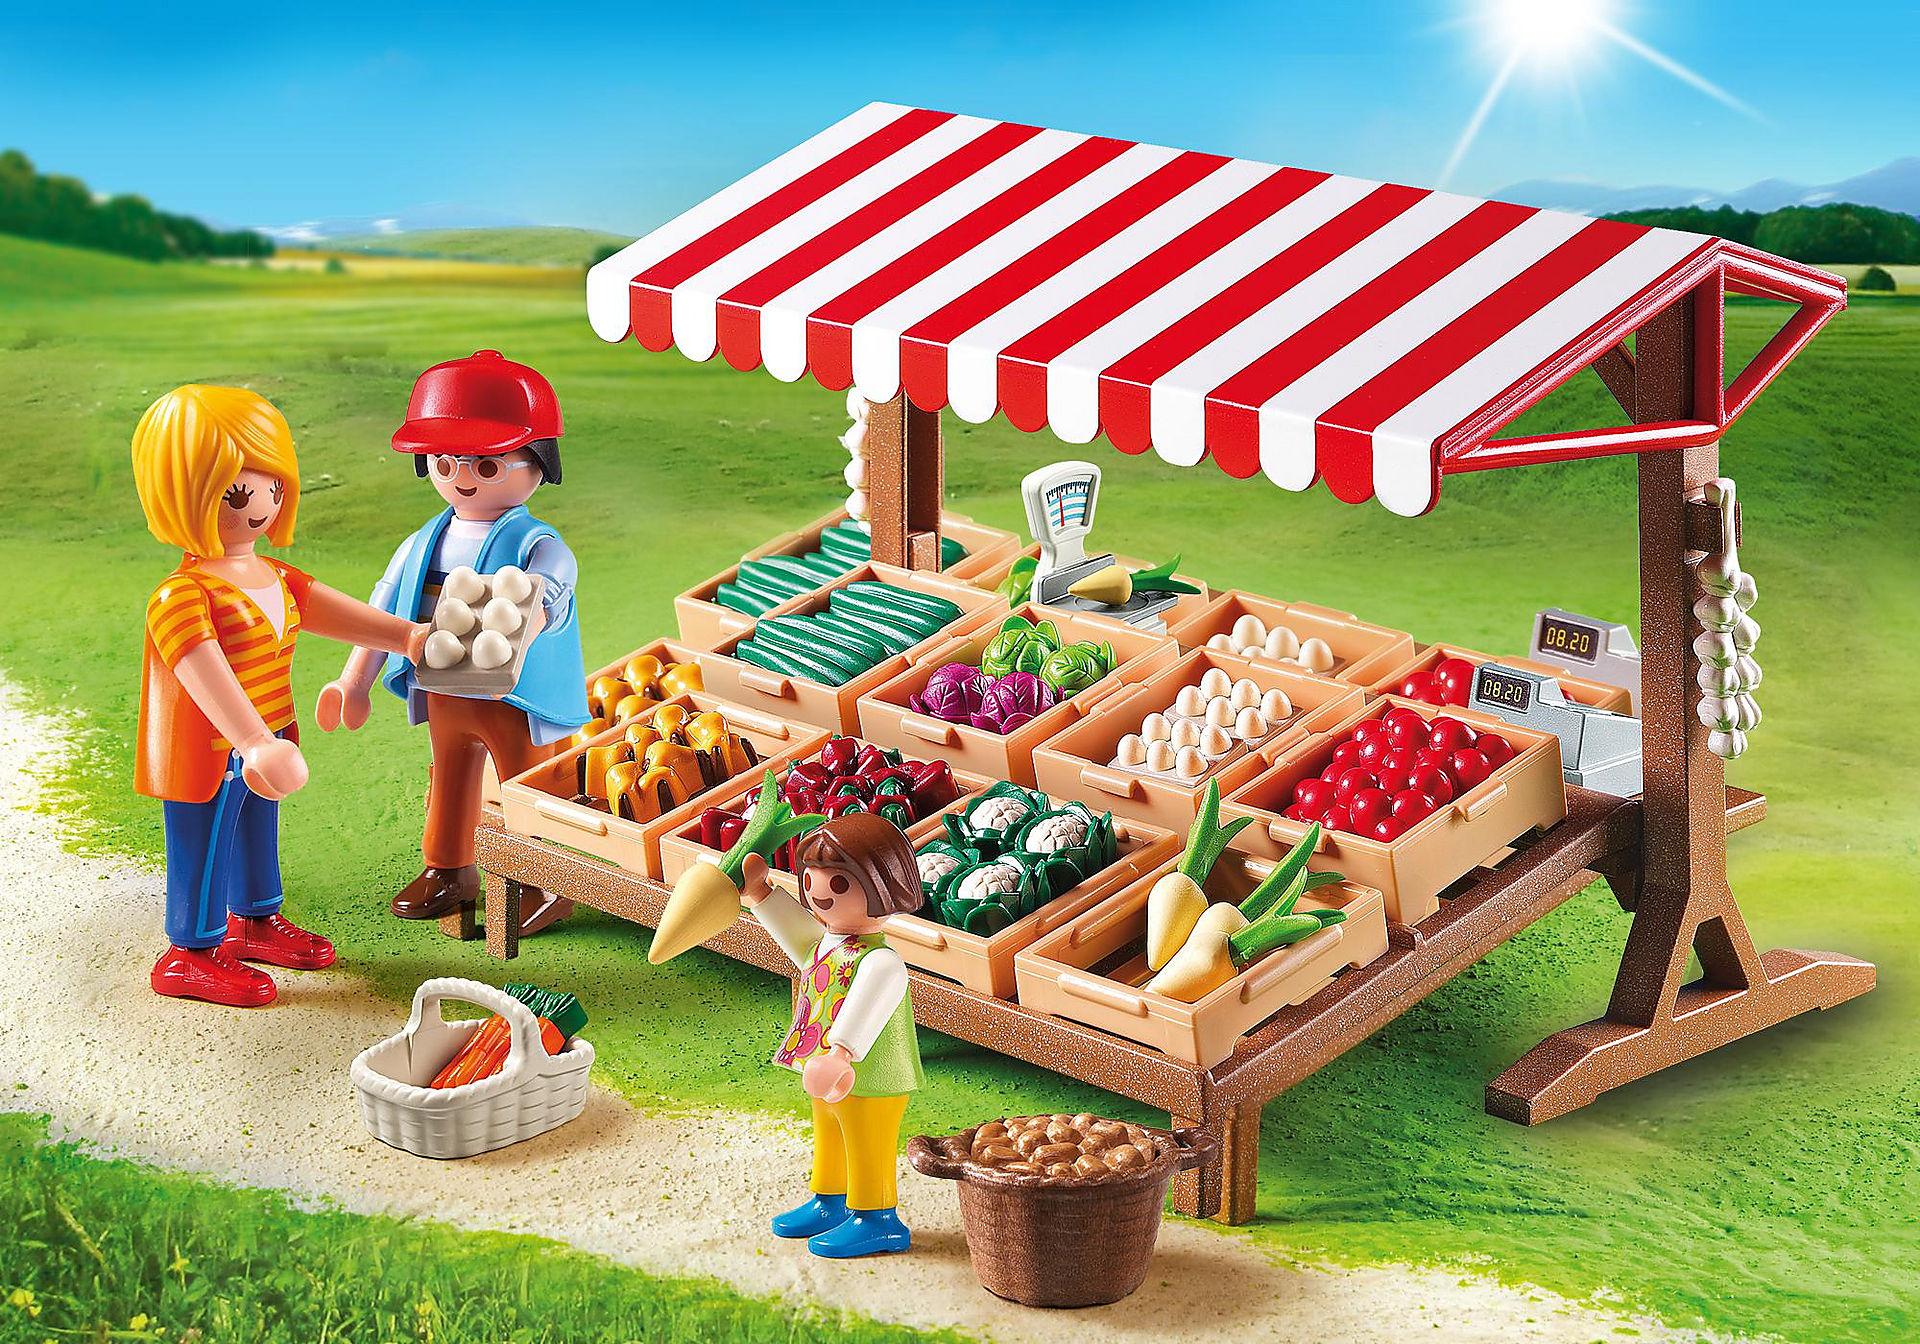 http://media.playmobil.com/i/playmobil/6121_product_detail/Marchand avec étal de légumes